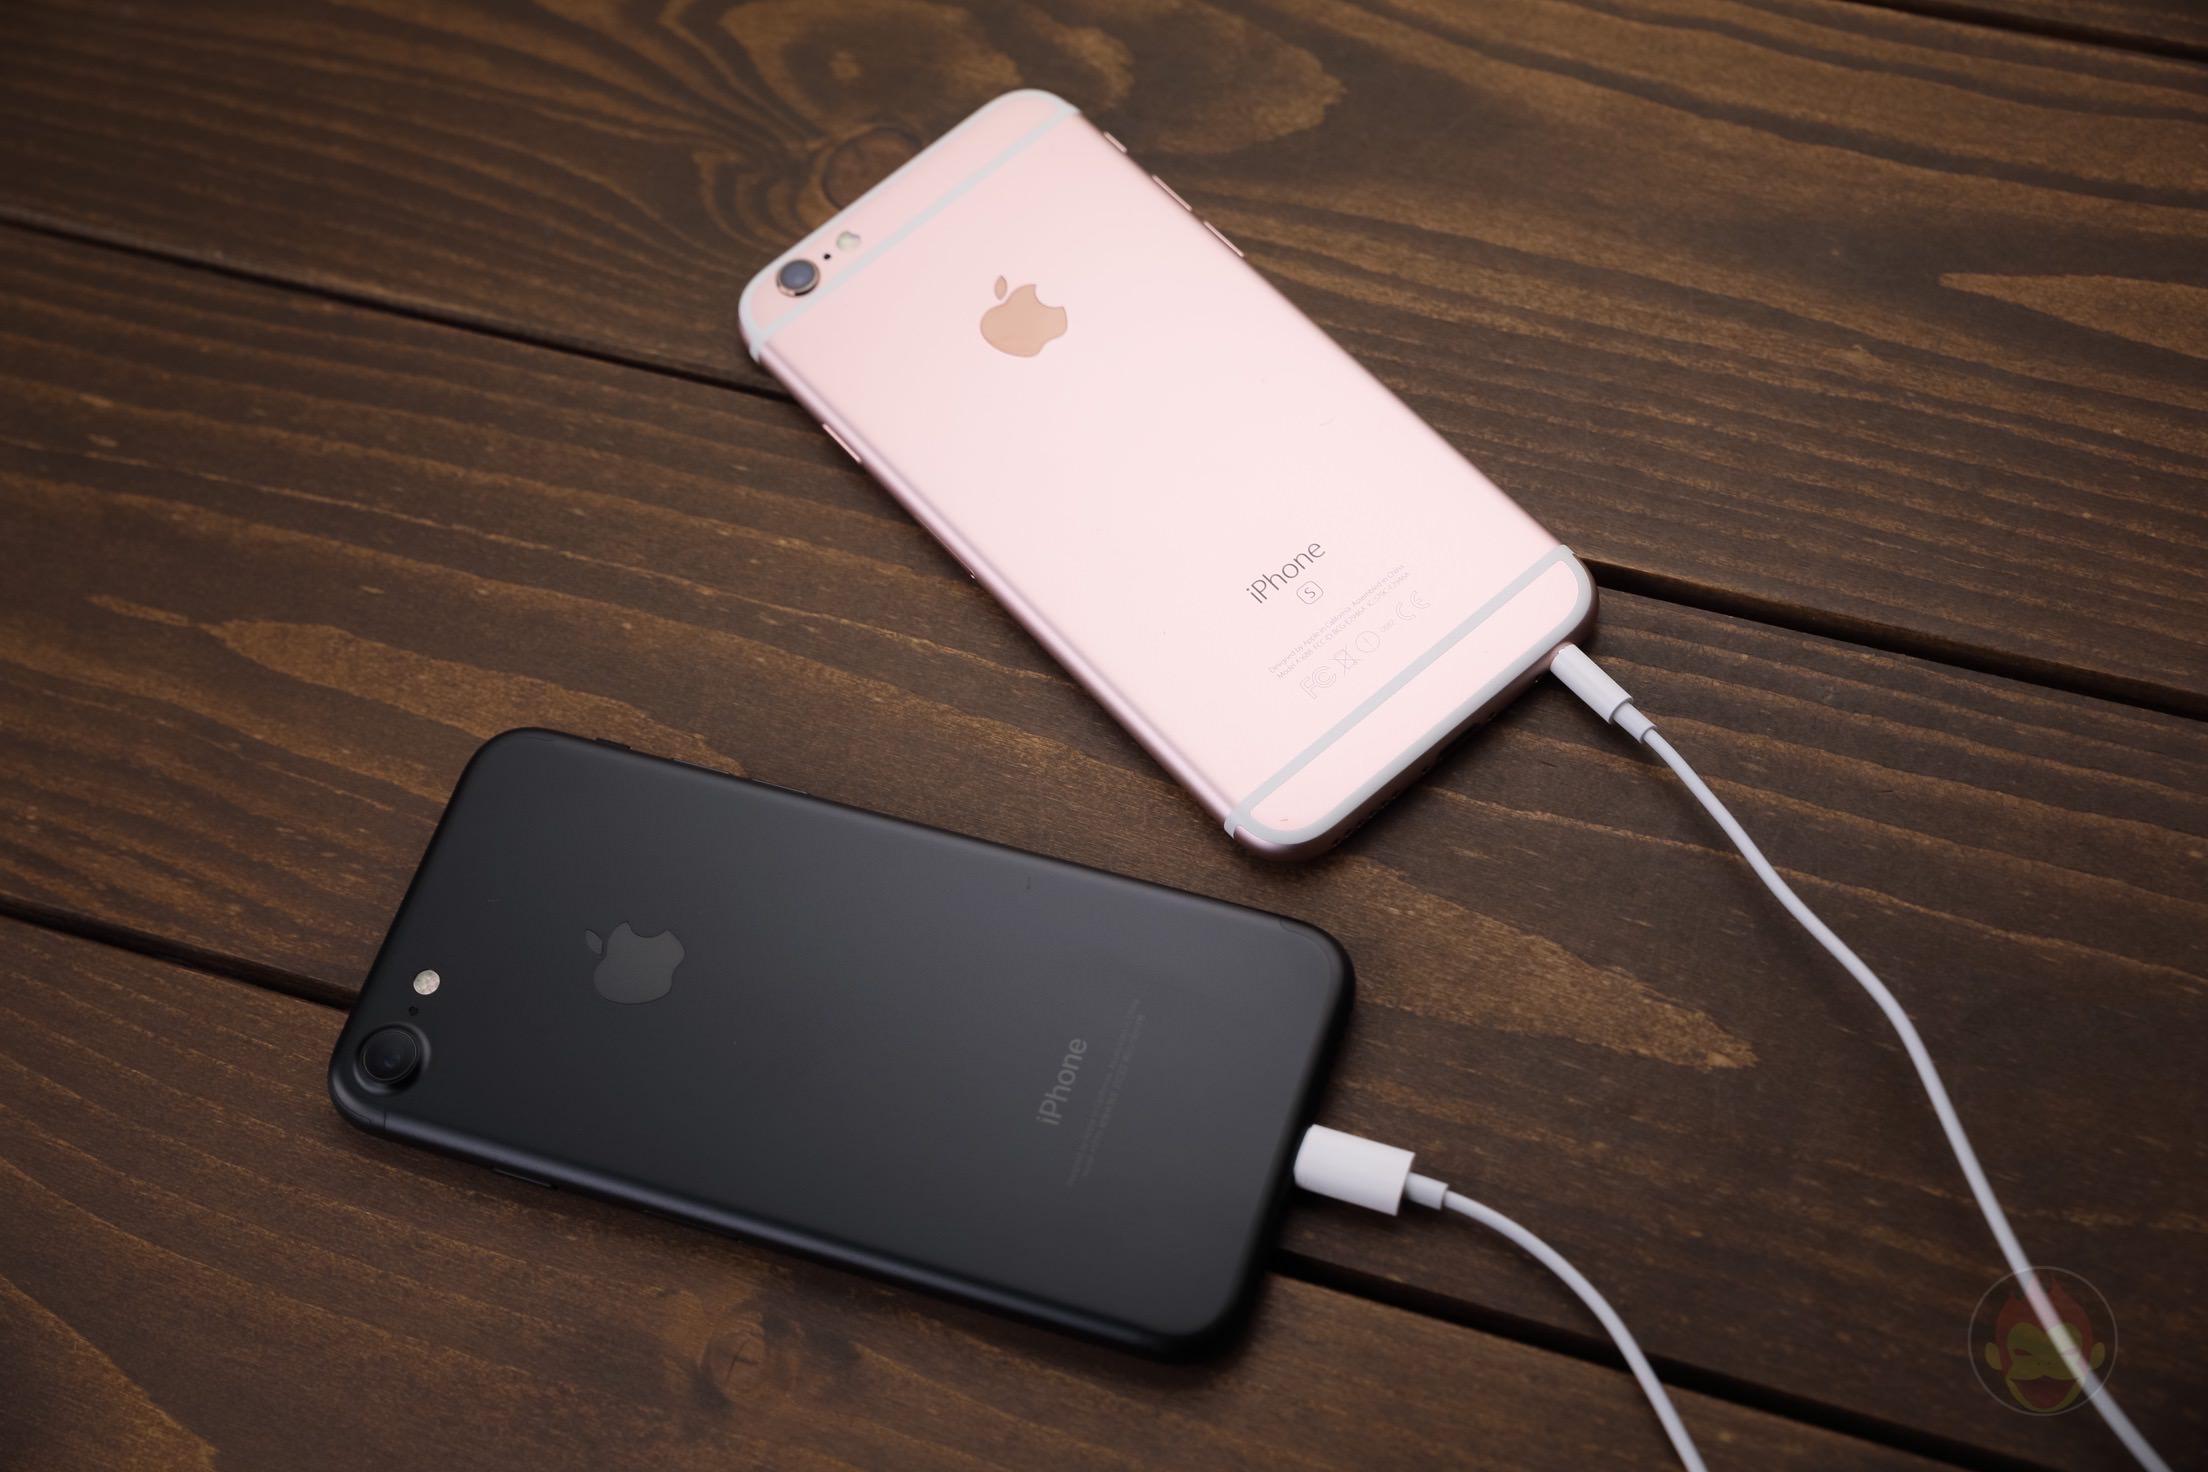 iPhone7-iPhone6s-Comparison-01.jpg